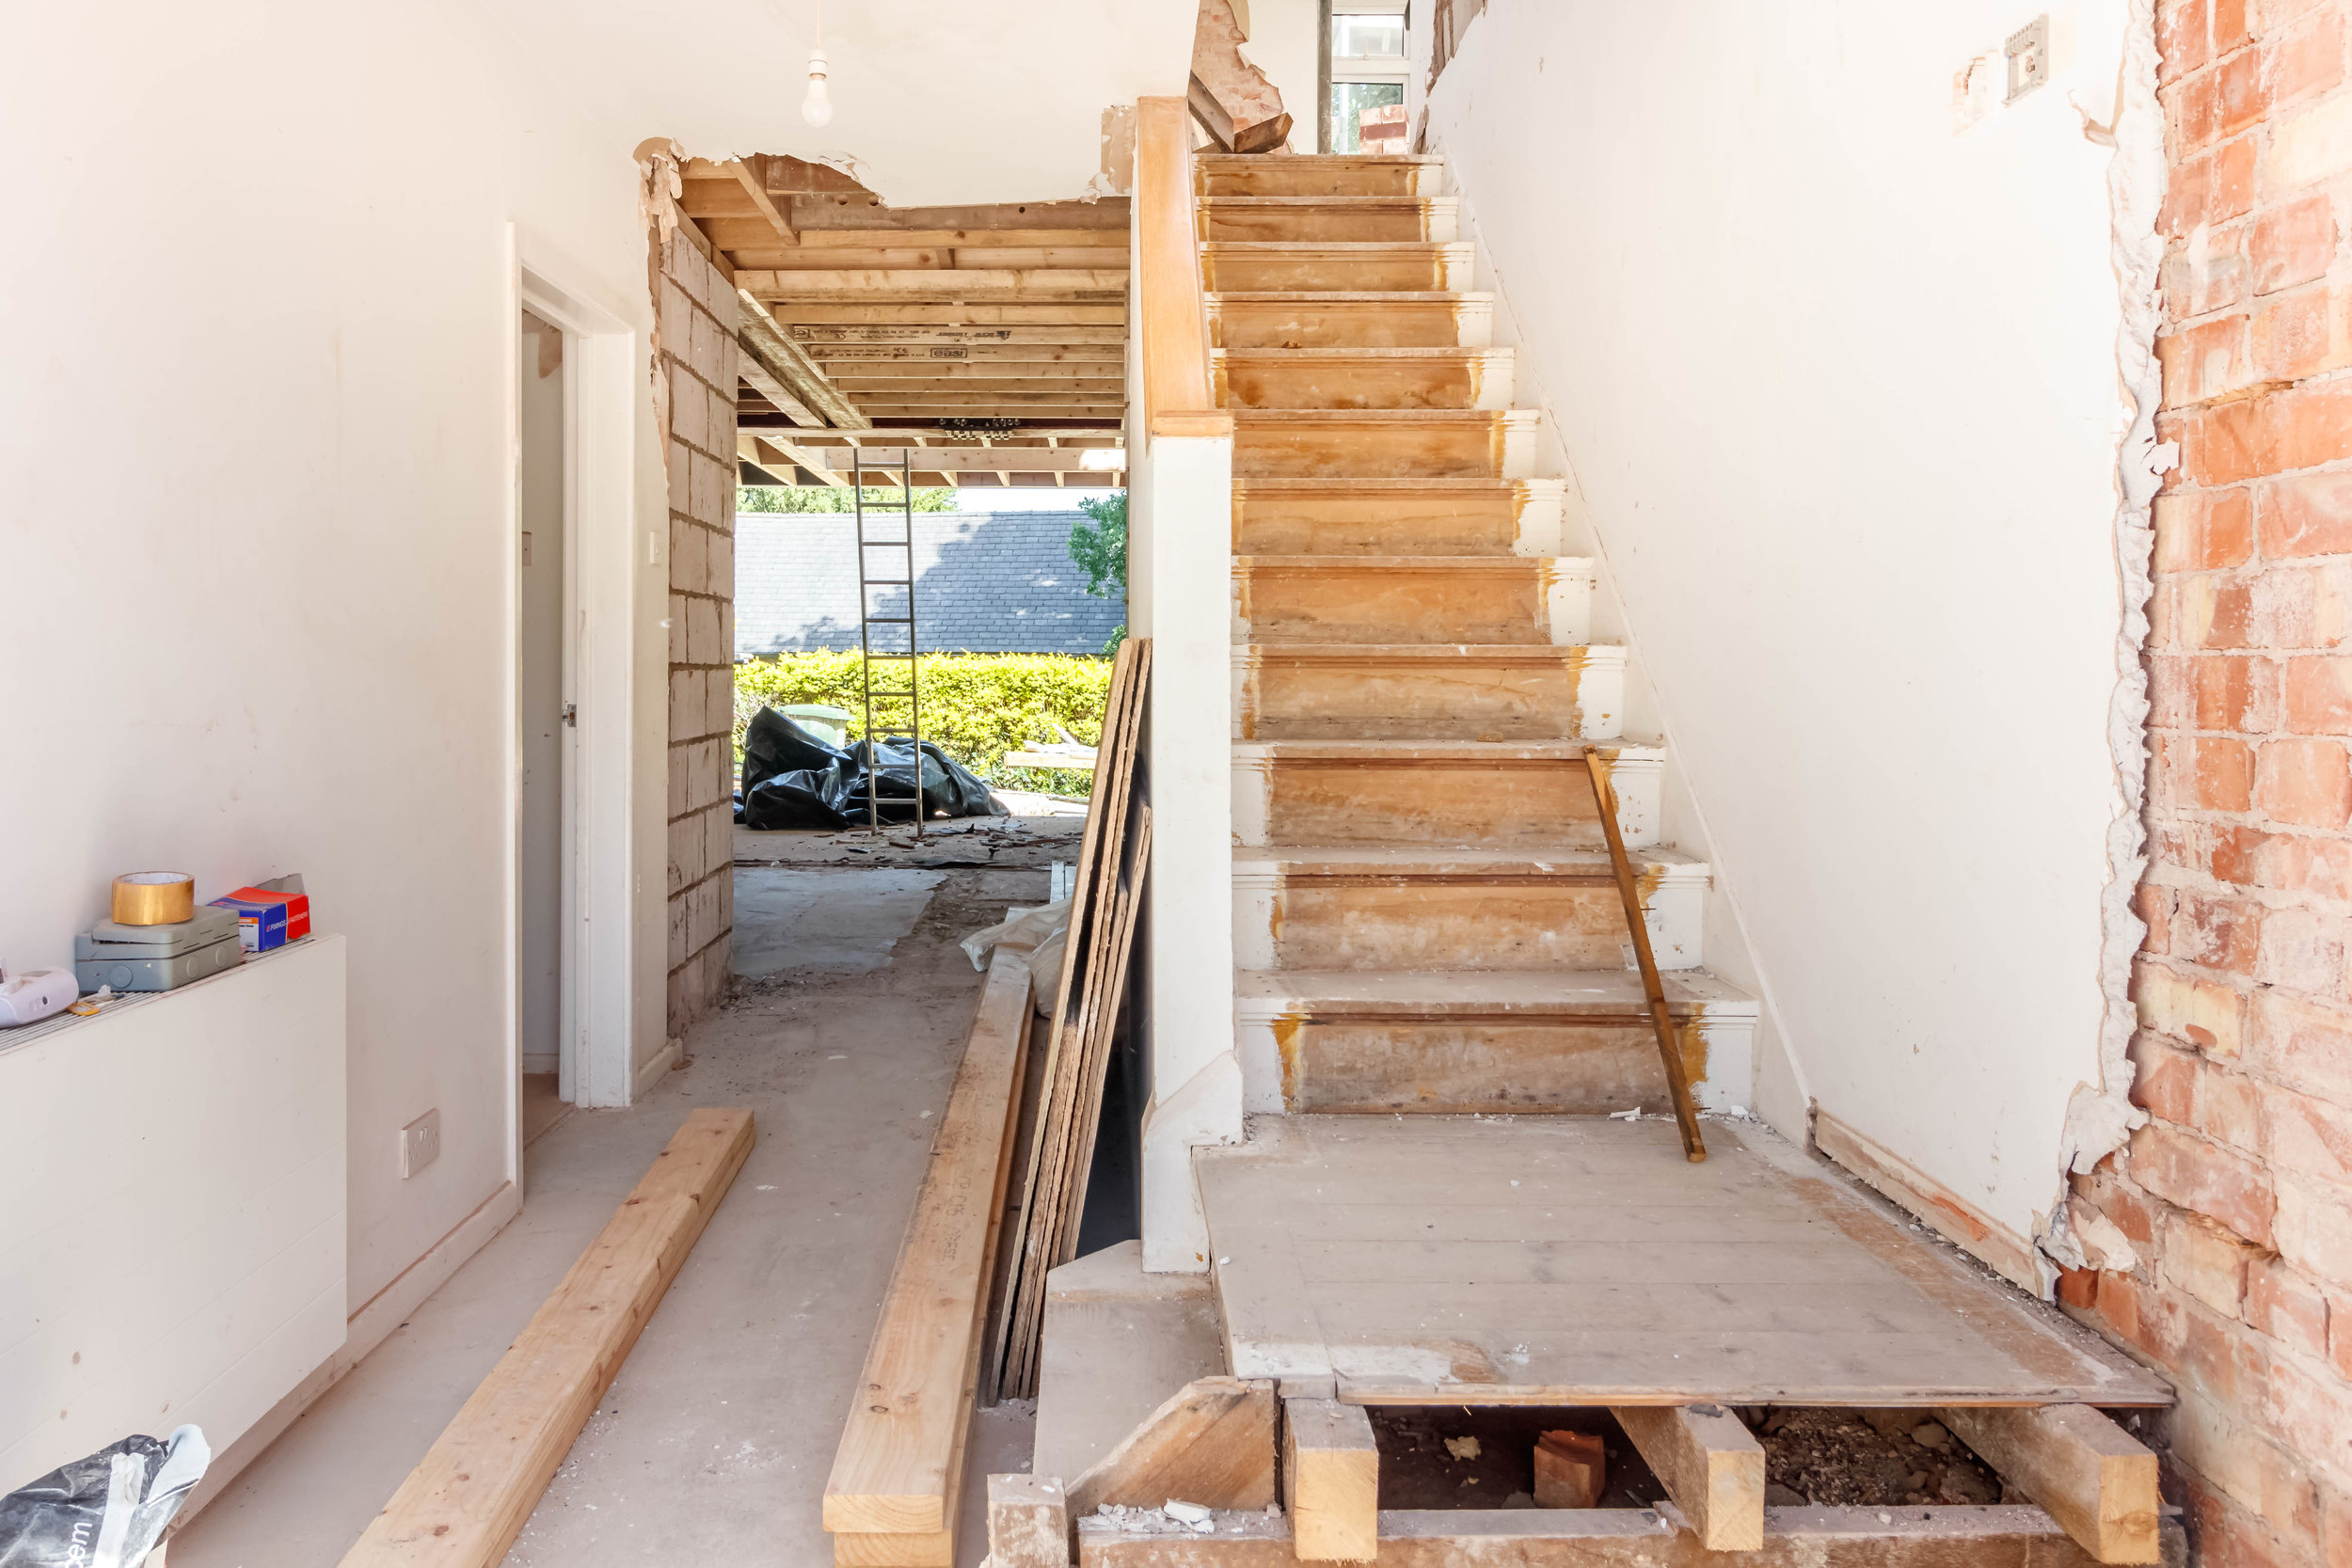 PropertyPhotographs-05160.jpg